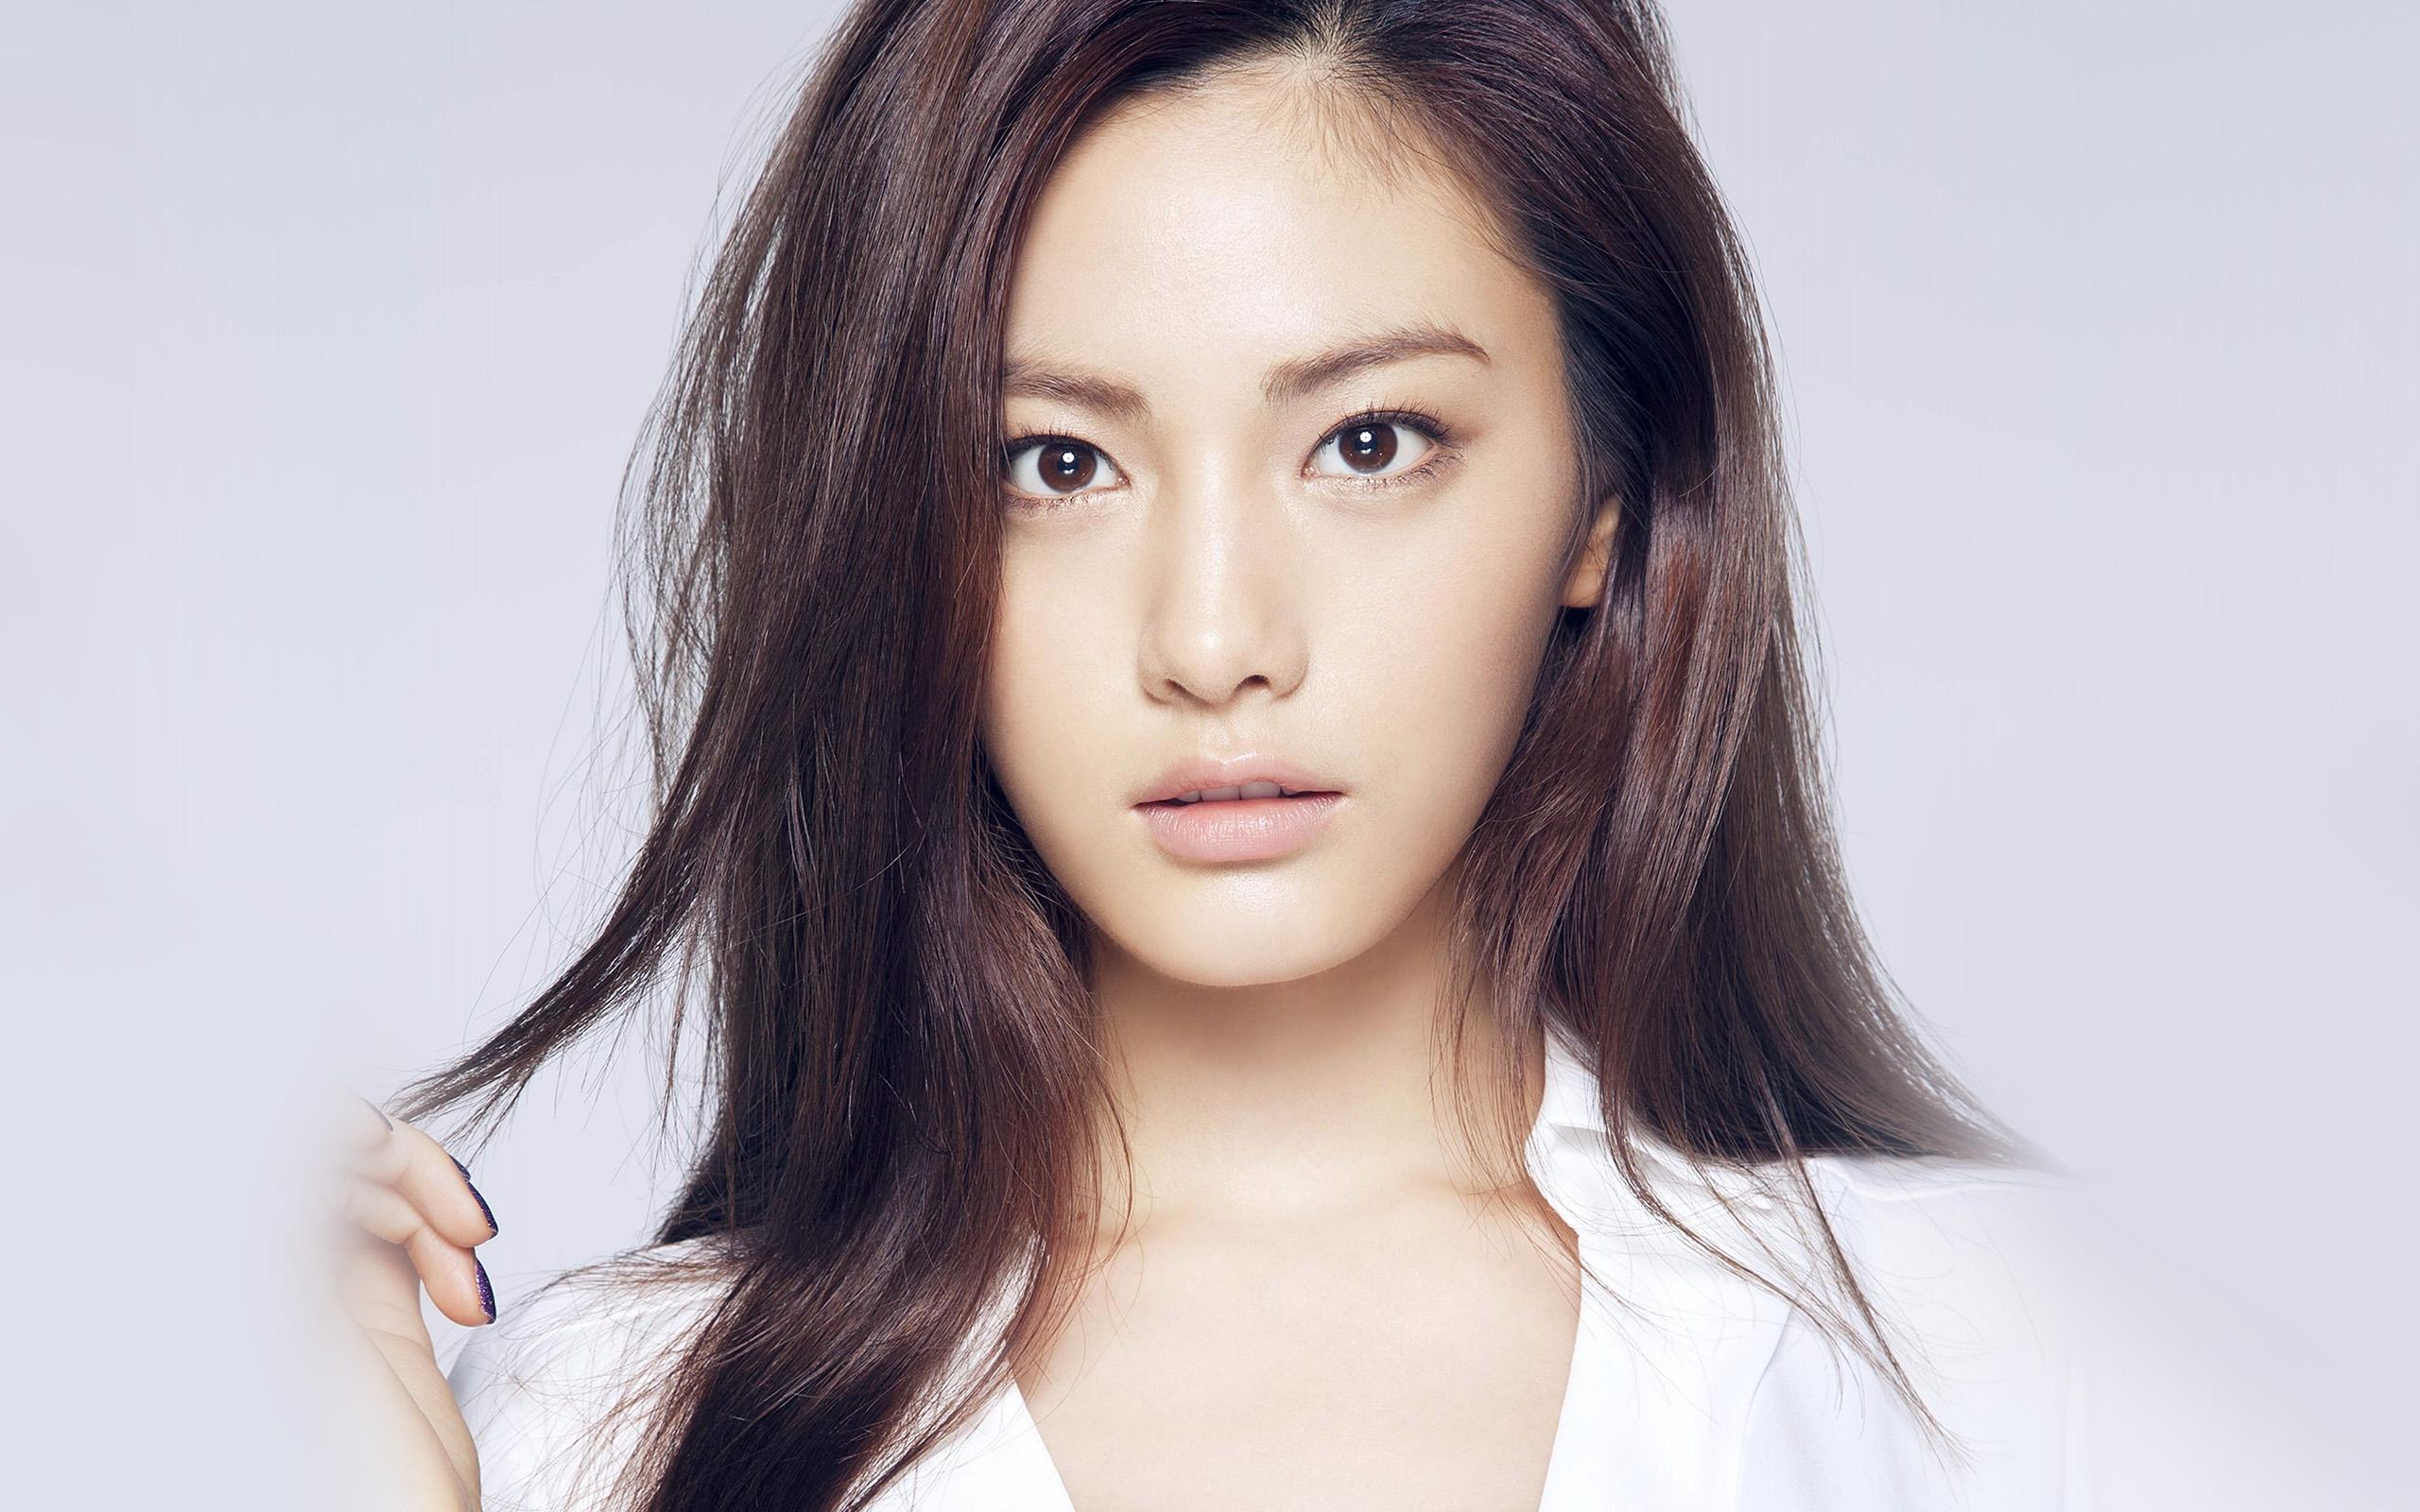 Hh81 Kpop Nana Beauty Wallpaper